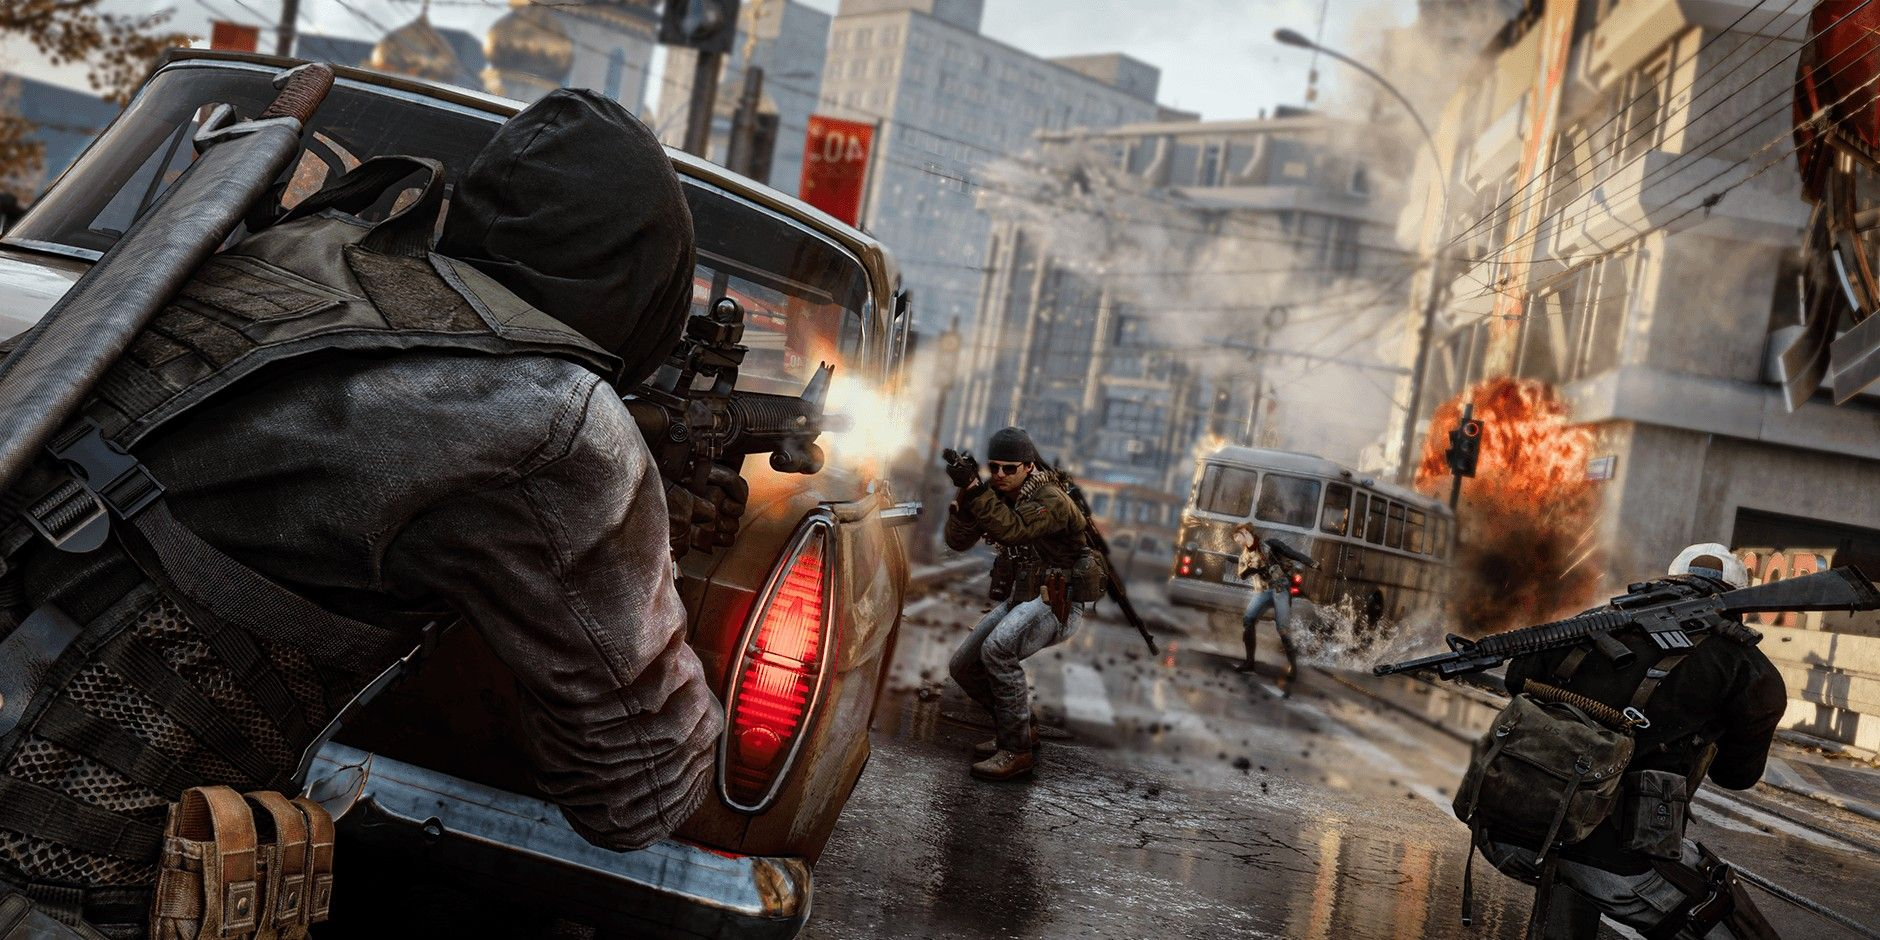 Call of Duty Warzone & Cold War Integration: Has It Gotten Better?